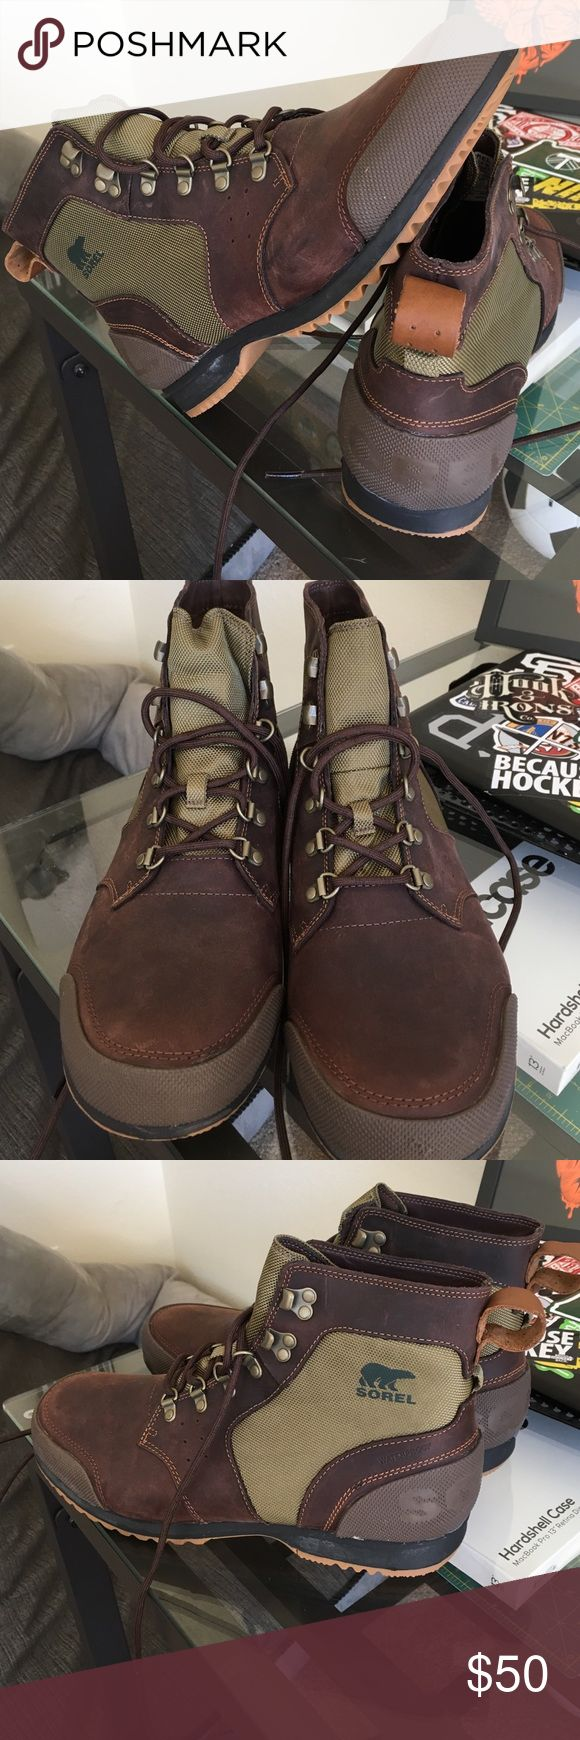 Sorel Men's Boots Sorel Men's boots. Size 12. Only tried on. Sorel Shoes Boots